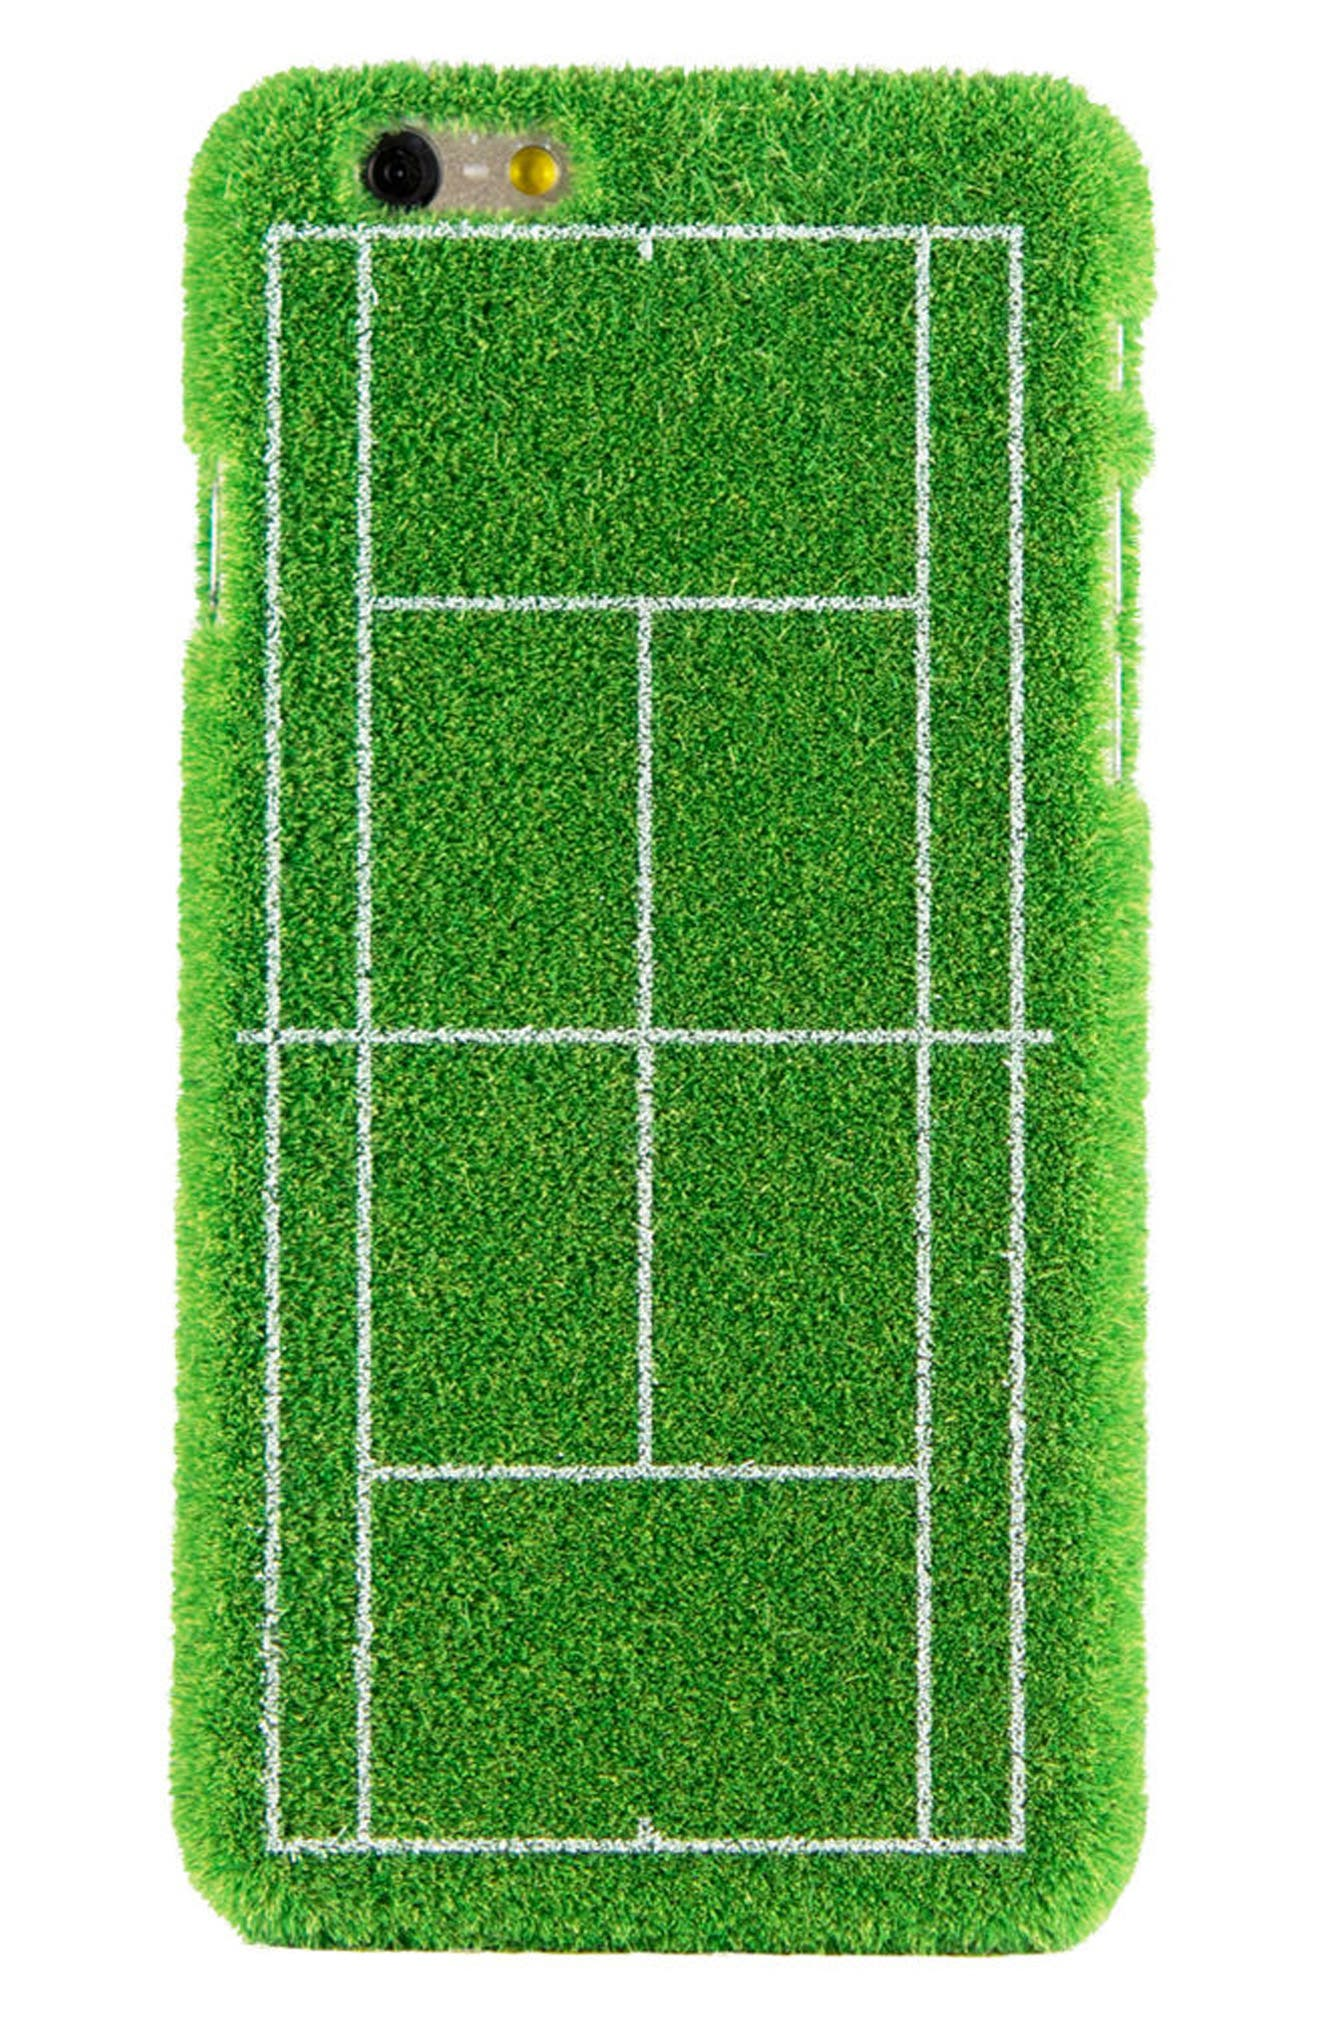 Shibaful Grand Slam Portable Park iPhone 6/6s & iPhone 6/6s Plus Case